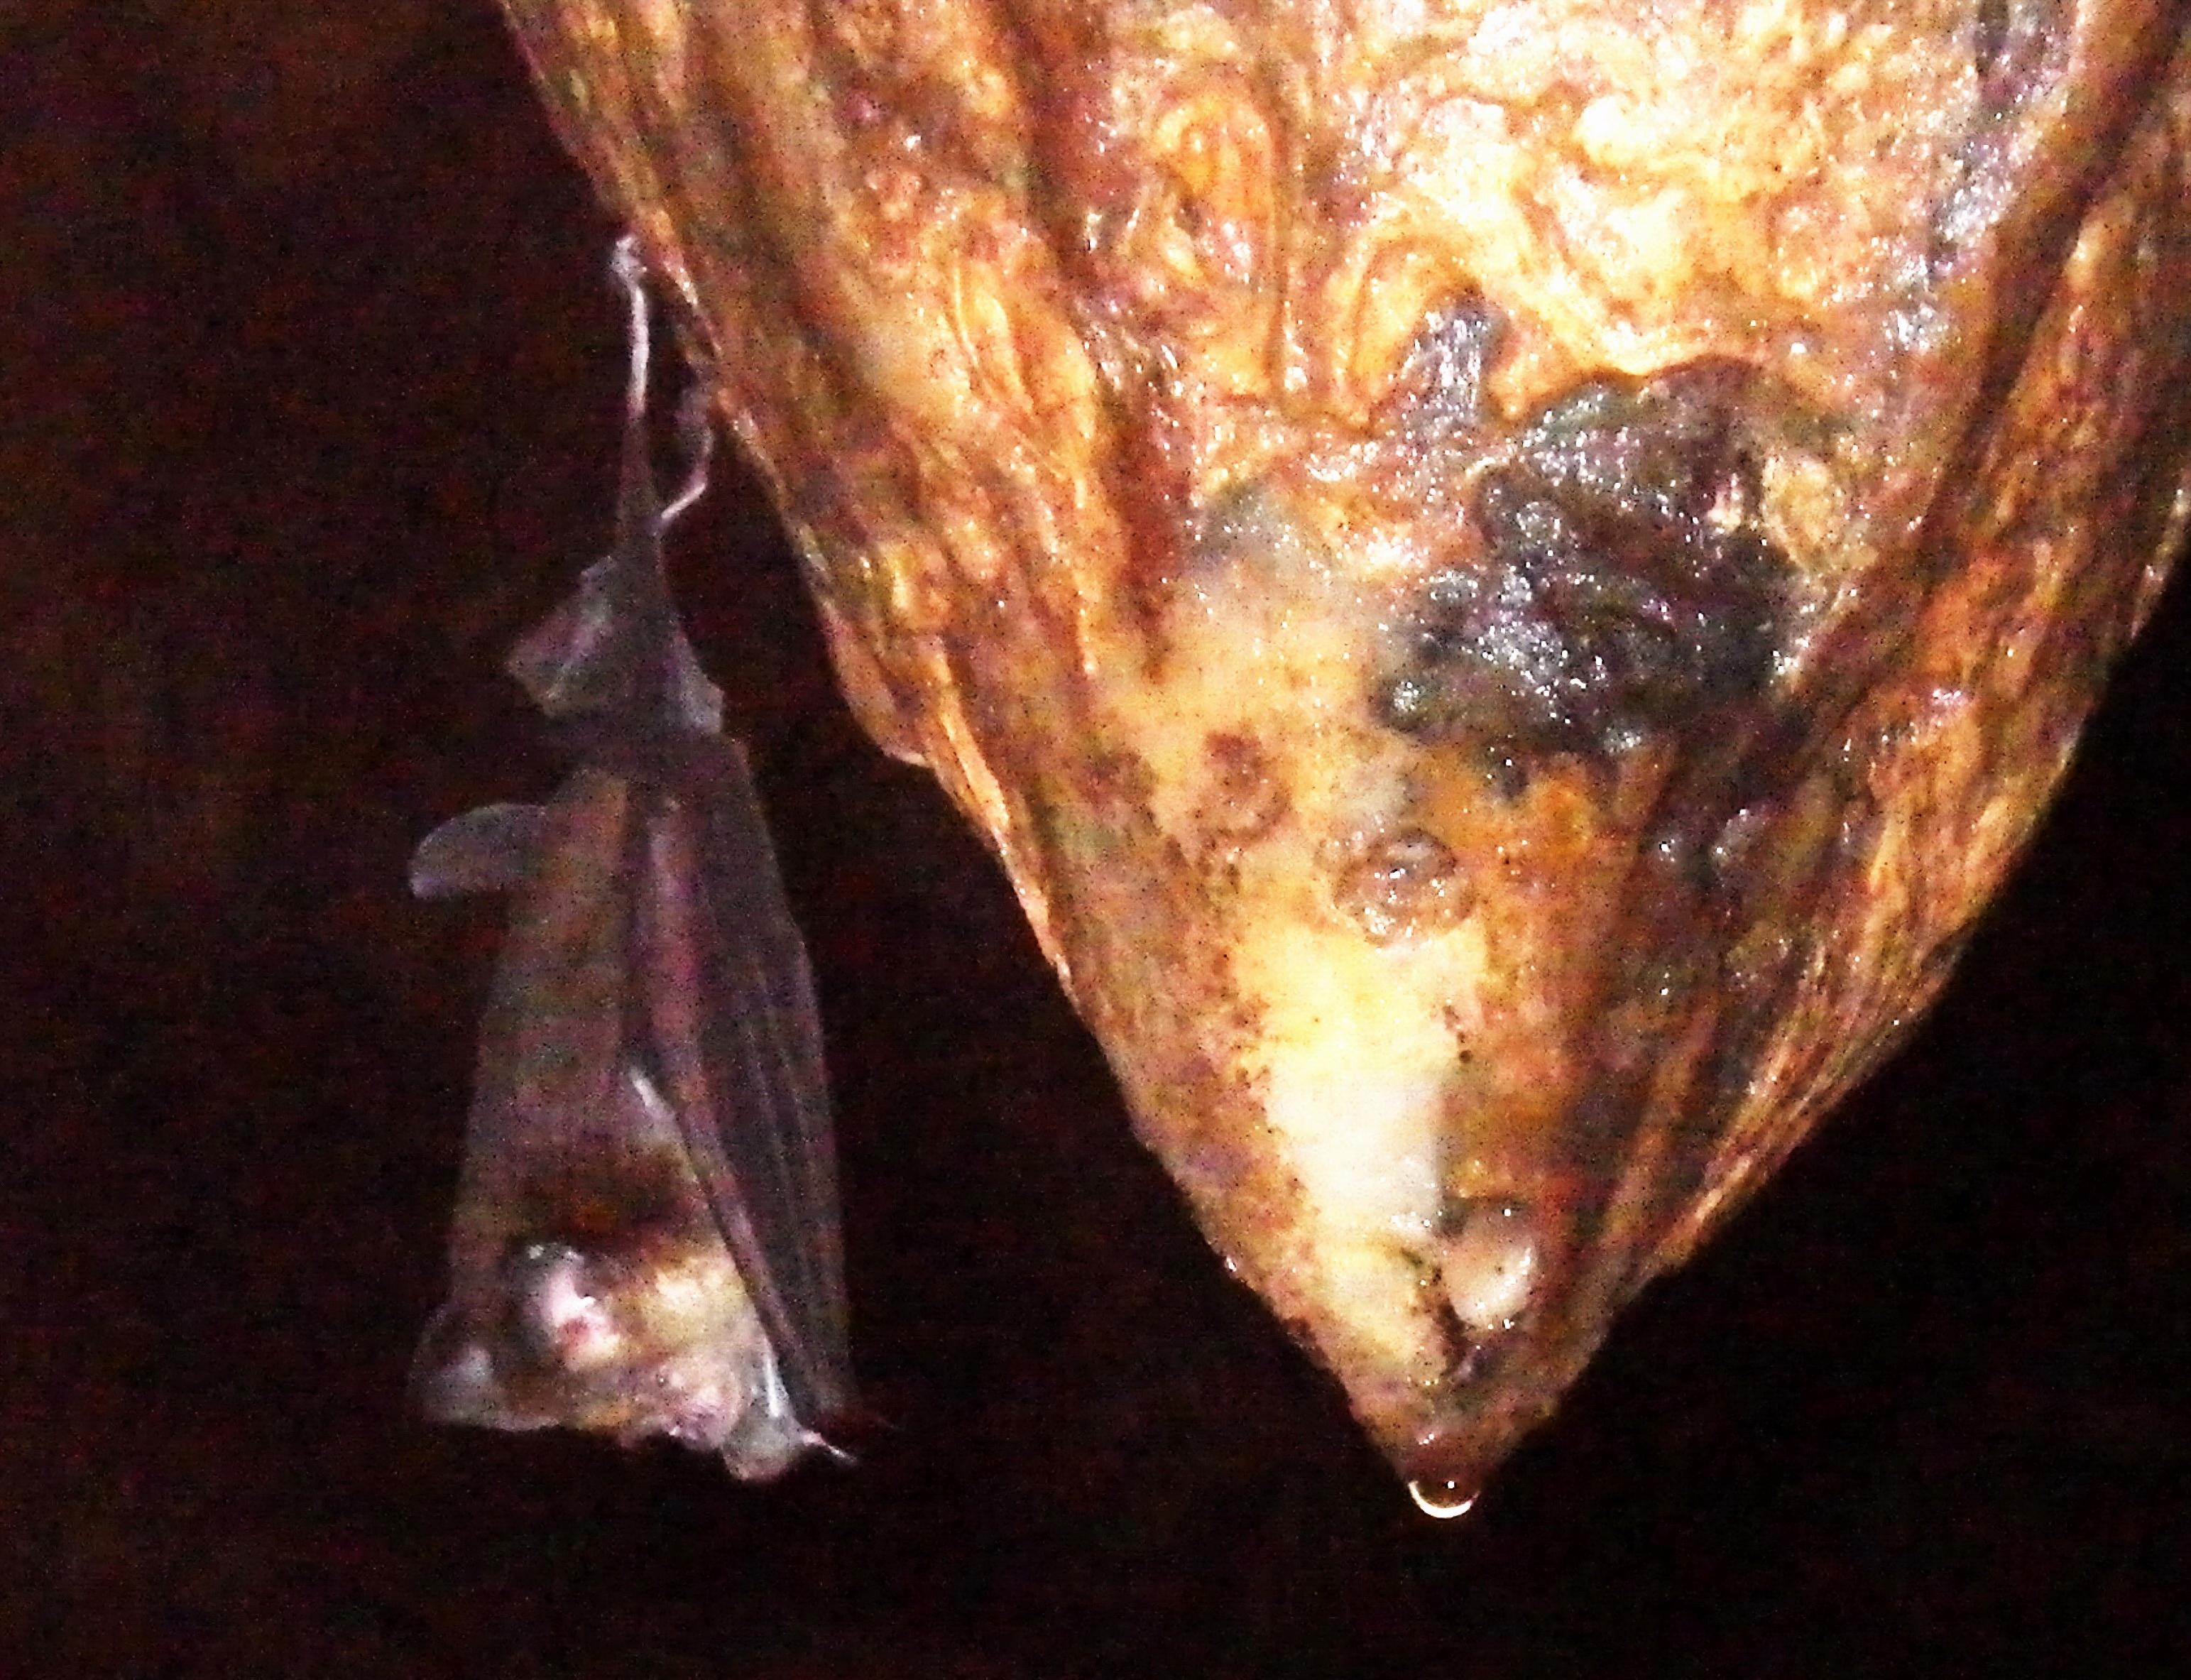 Asian wrinkle lipped bat